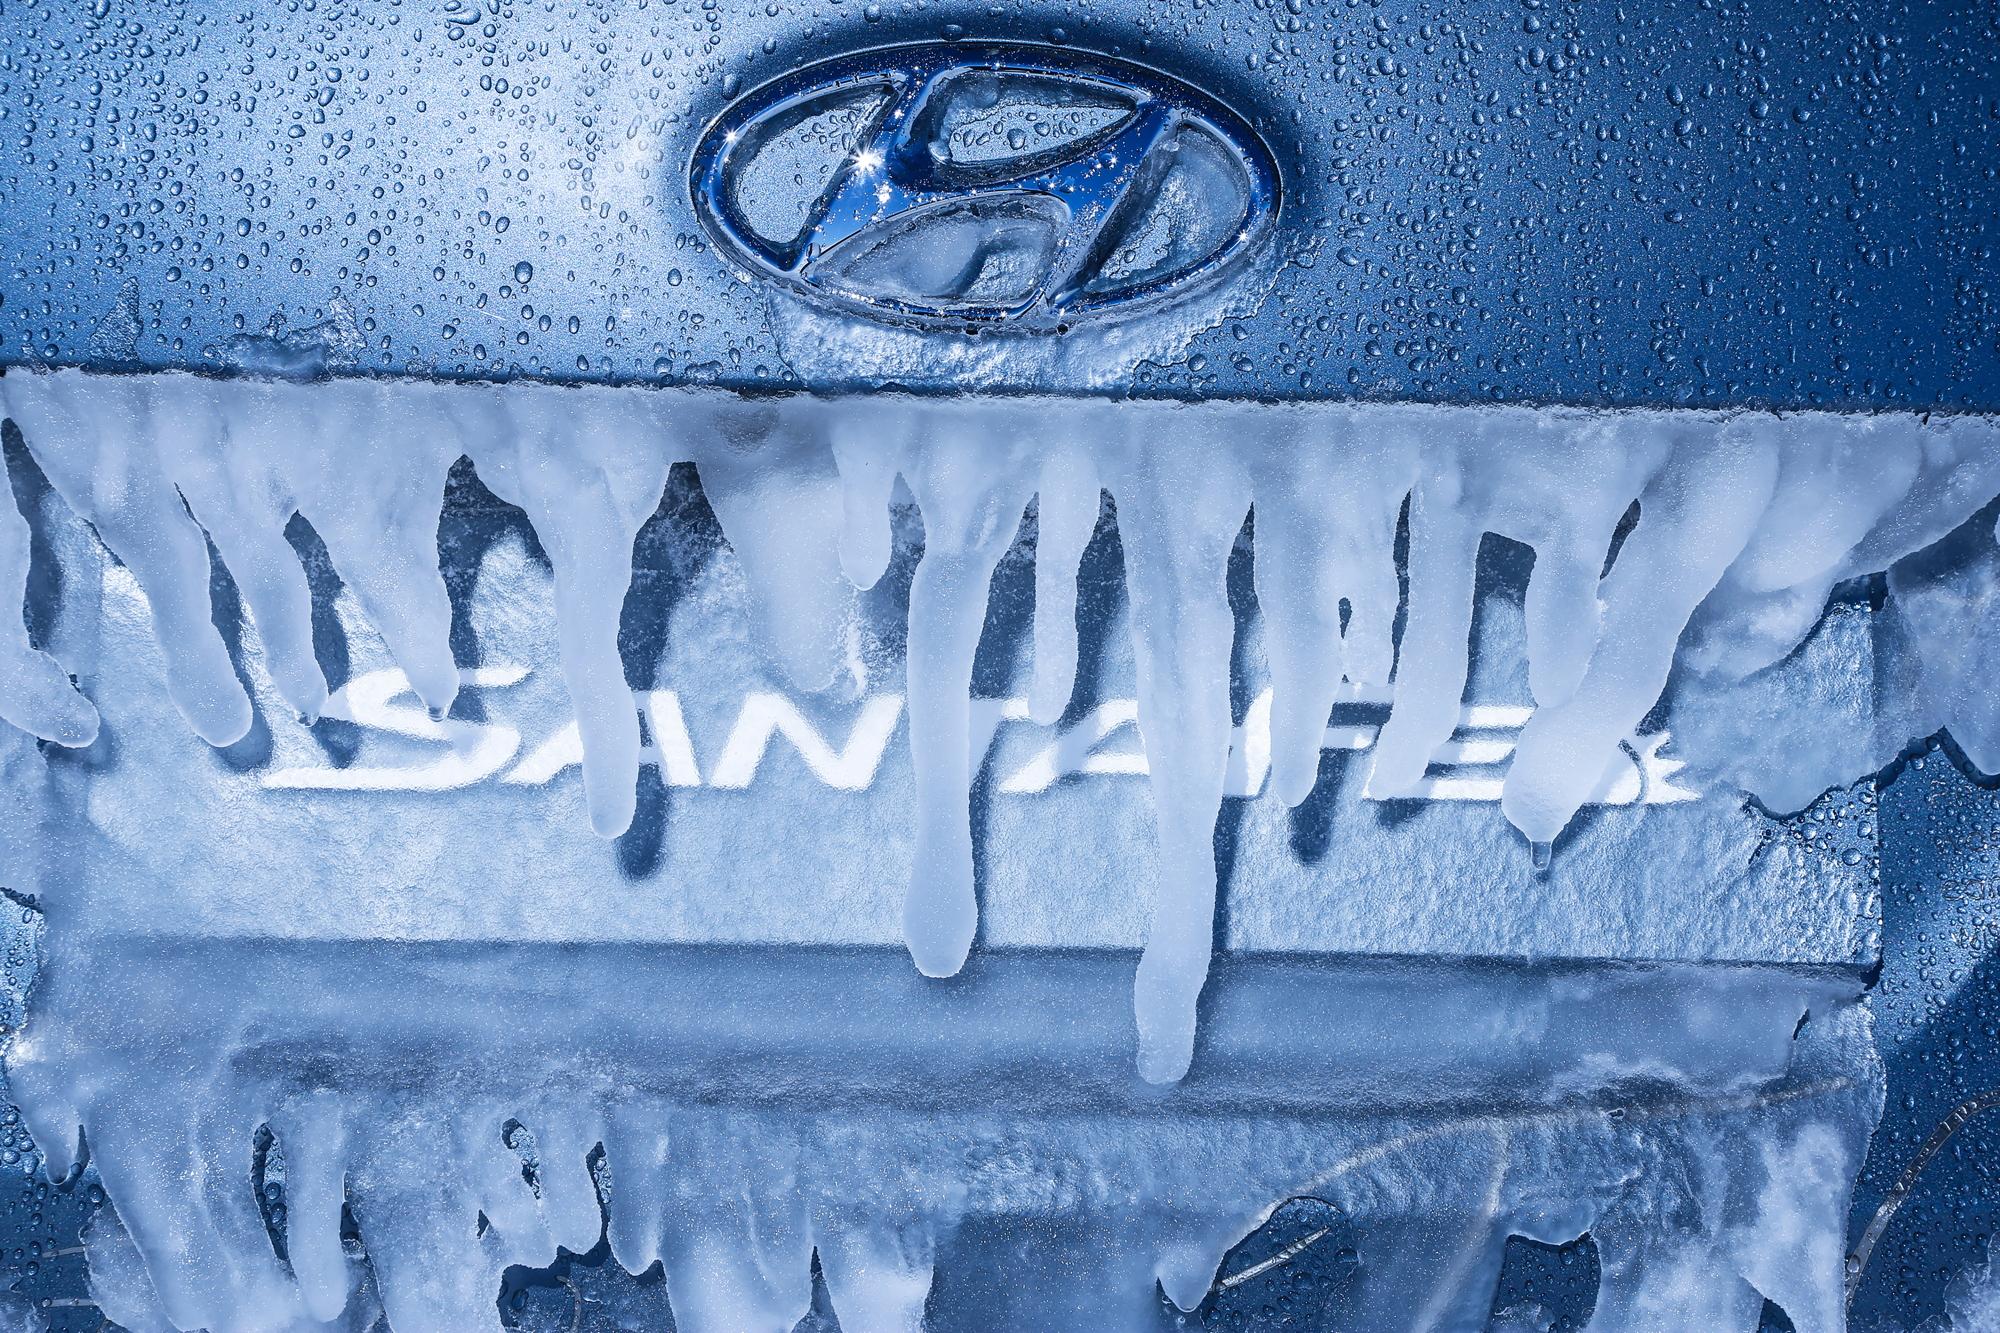 Antarctica Hyundai Santa Fe ice